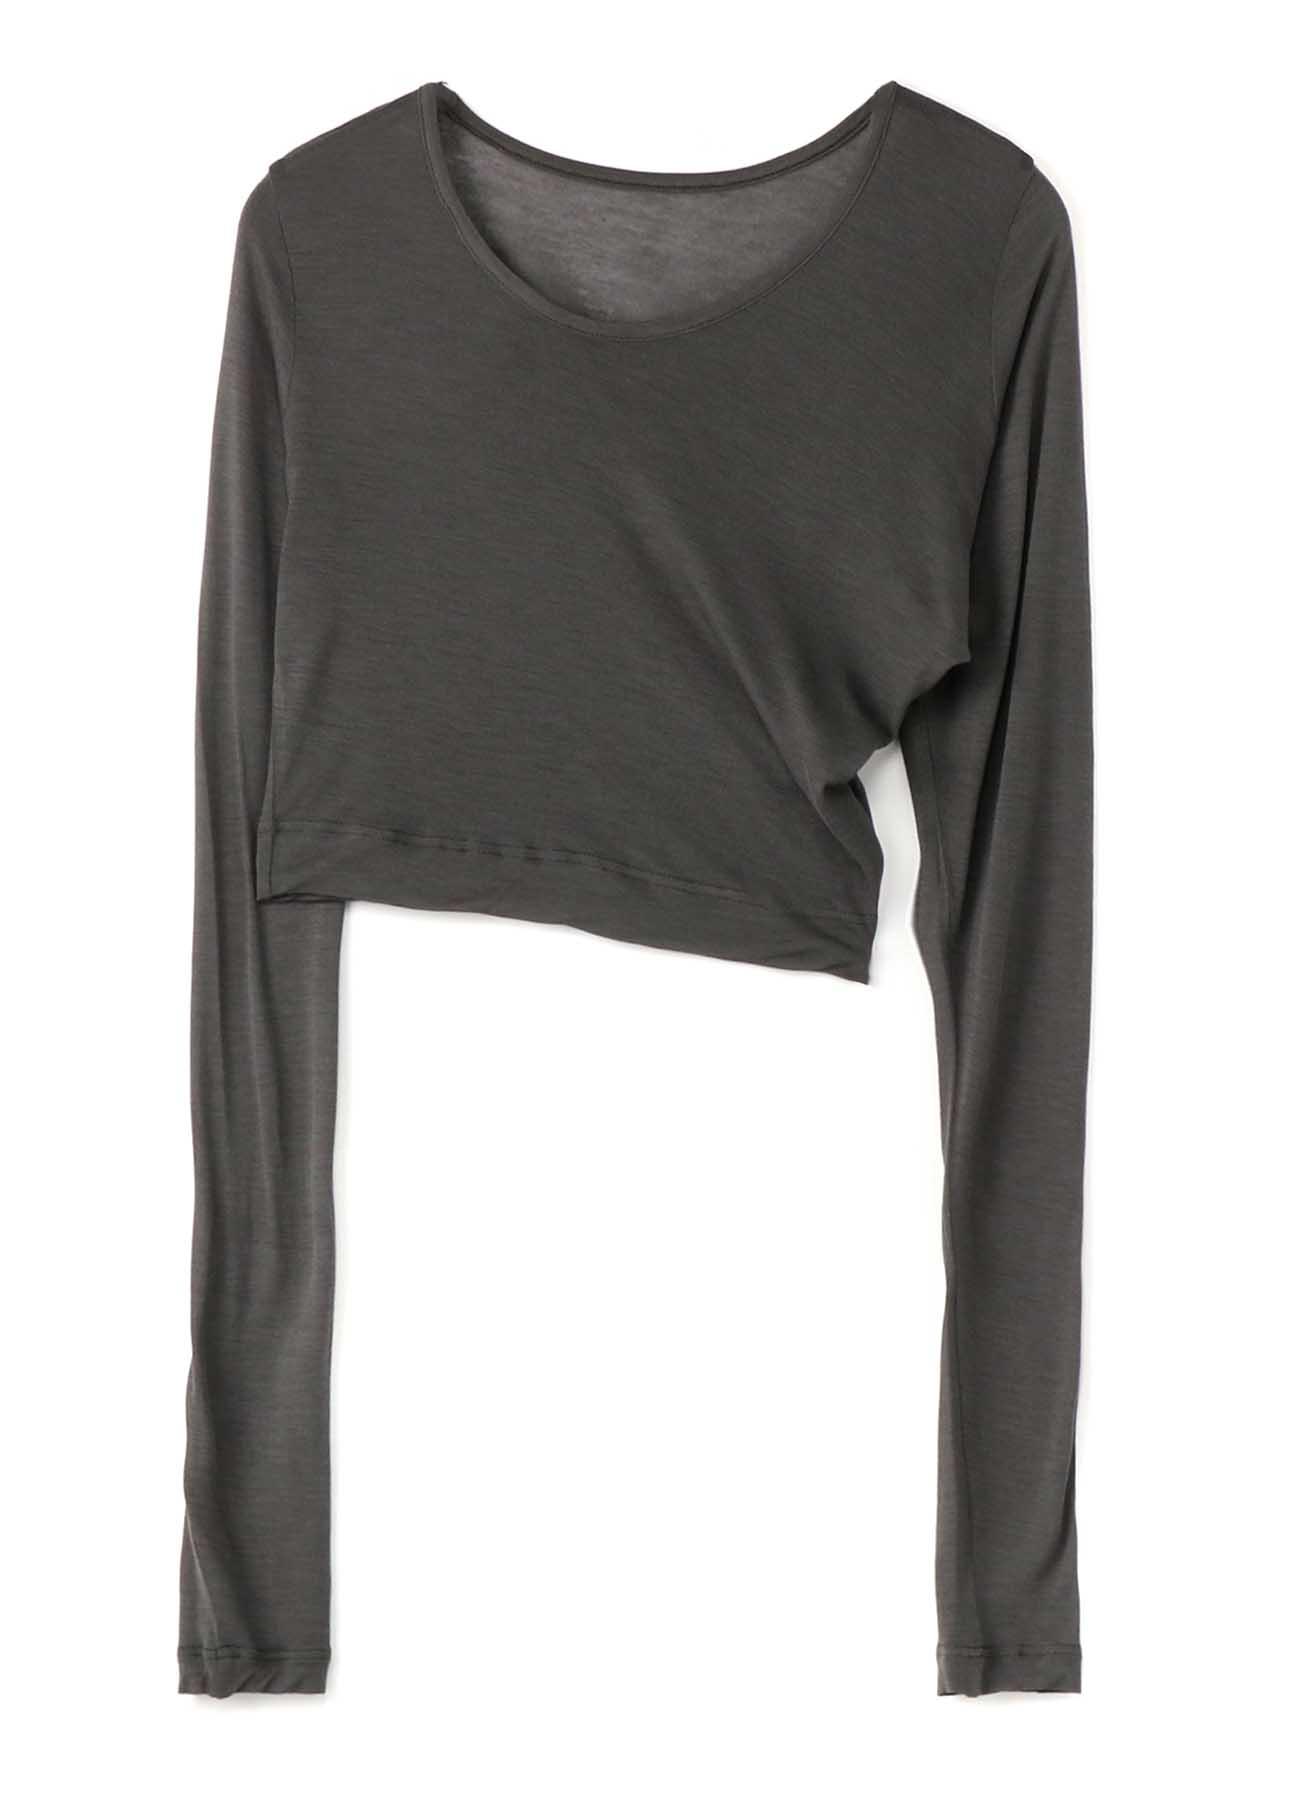 Ry/Si Plain Stitch Short Design T